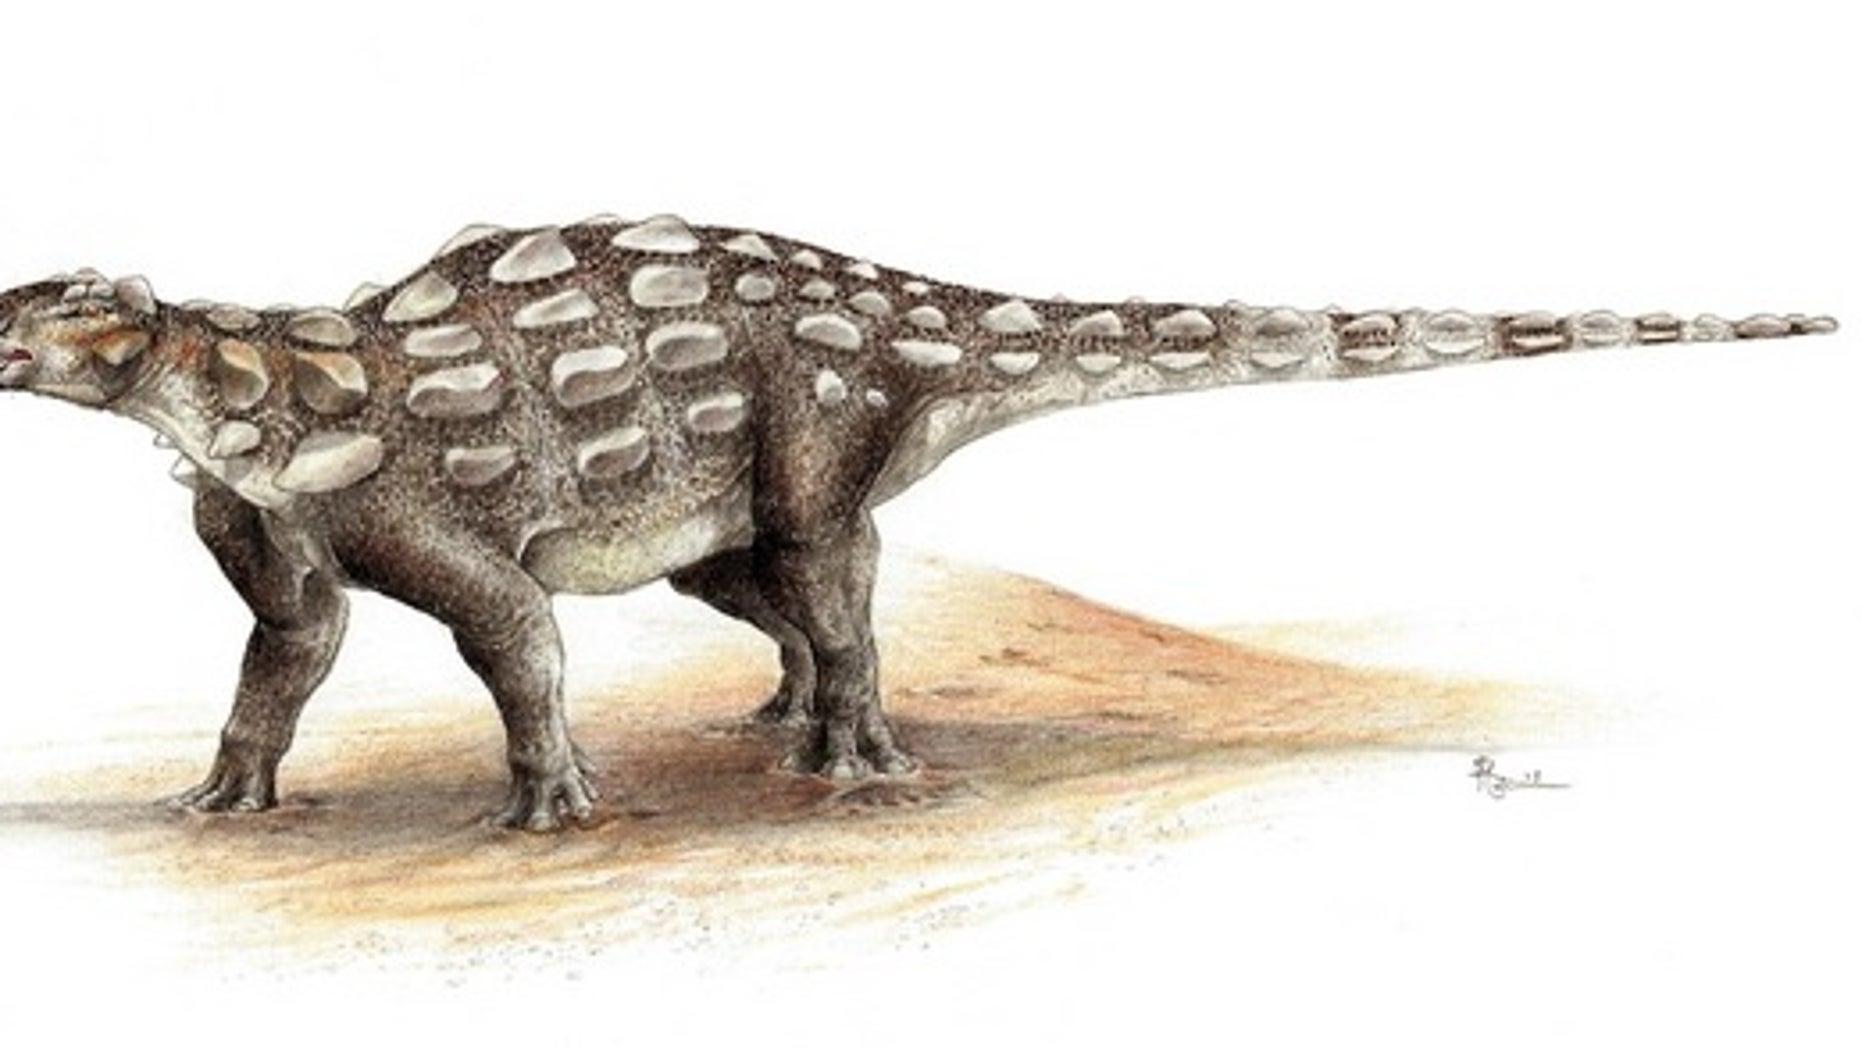 An illustration of <em>Gobisaurus</em>, an ankylosaur with a stiff tail but no knob of bone at the end.